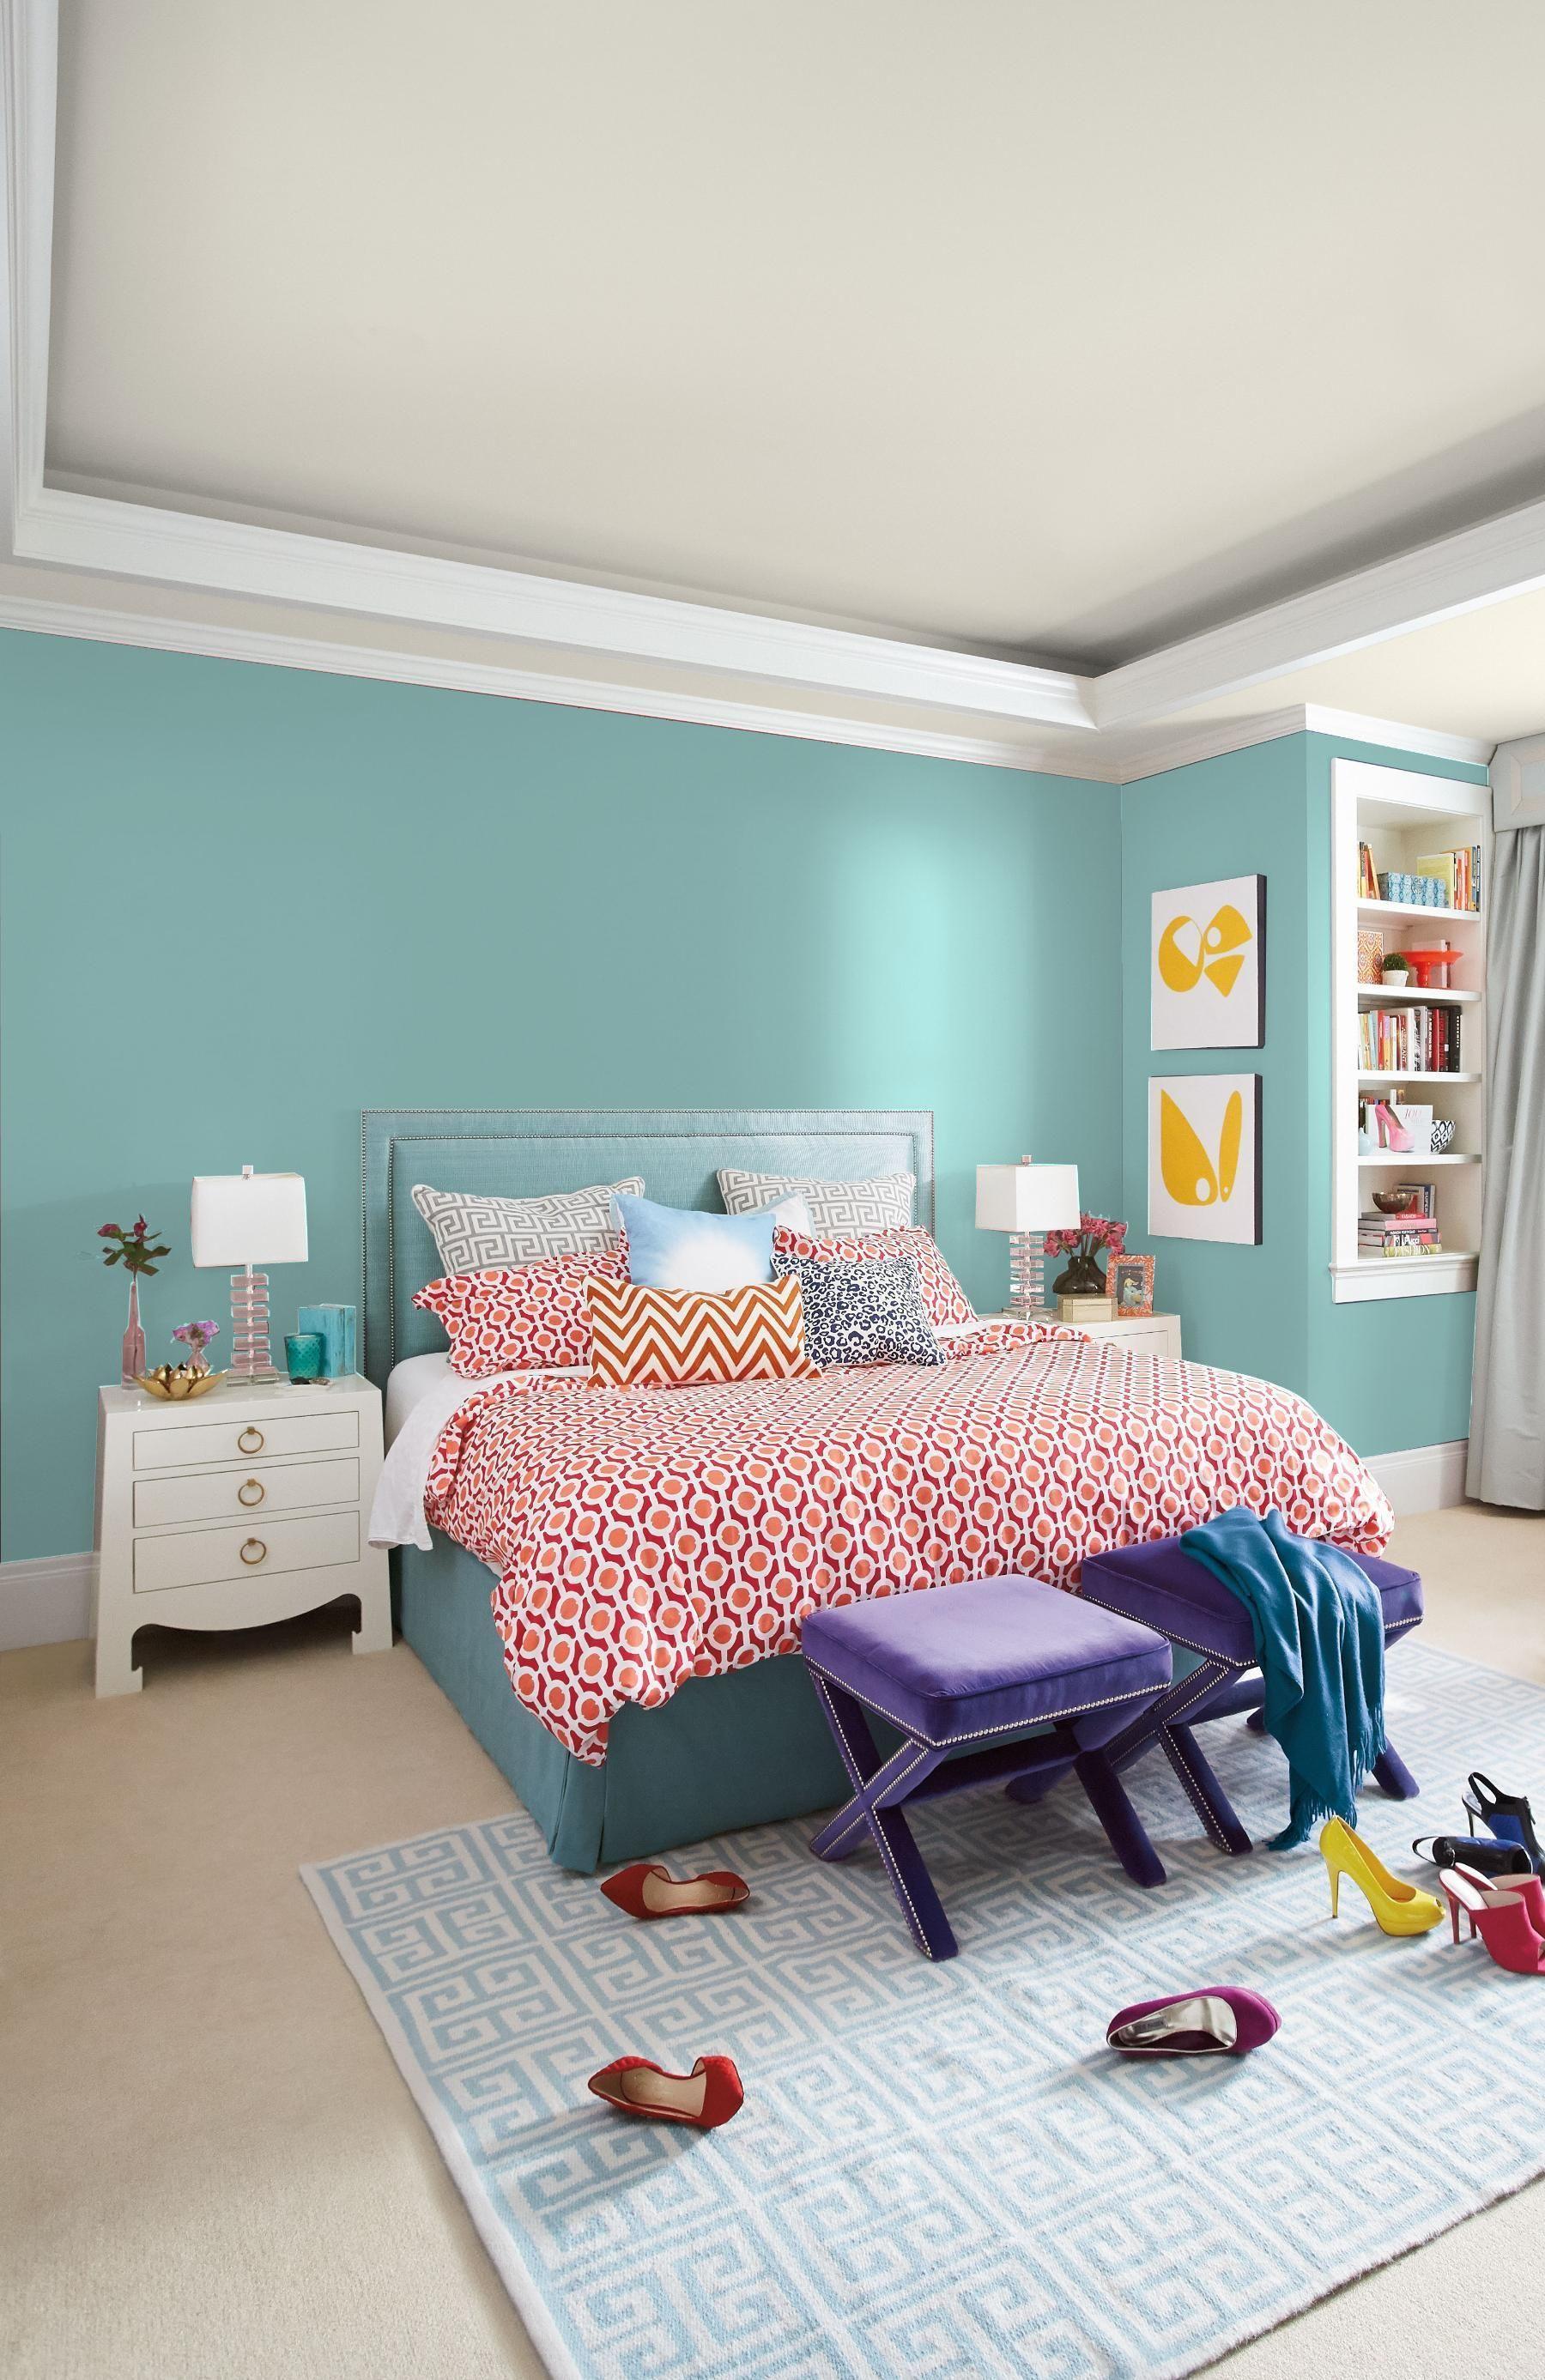 Dutch Boy Turquoise Powder 132 3db Boys Room Colors Dutch Boy Paint Colors Room Color Combination